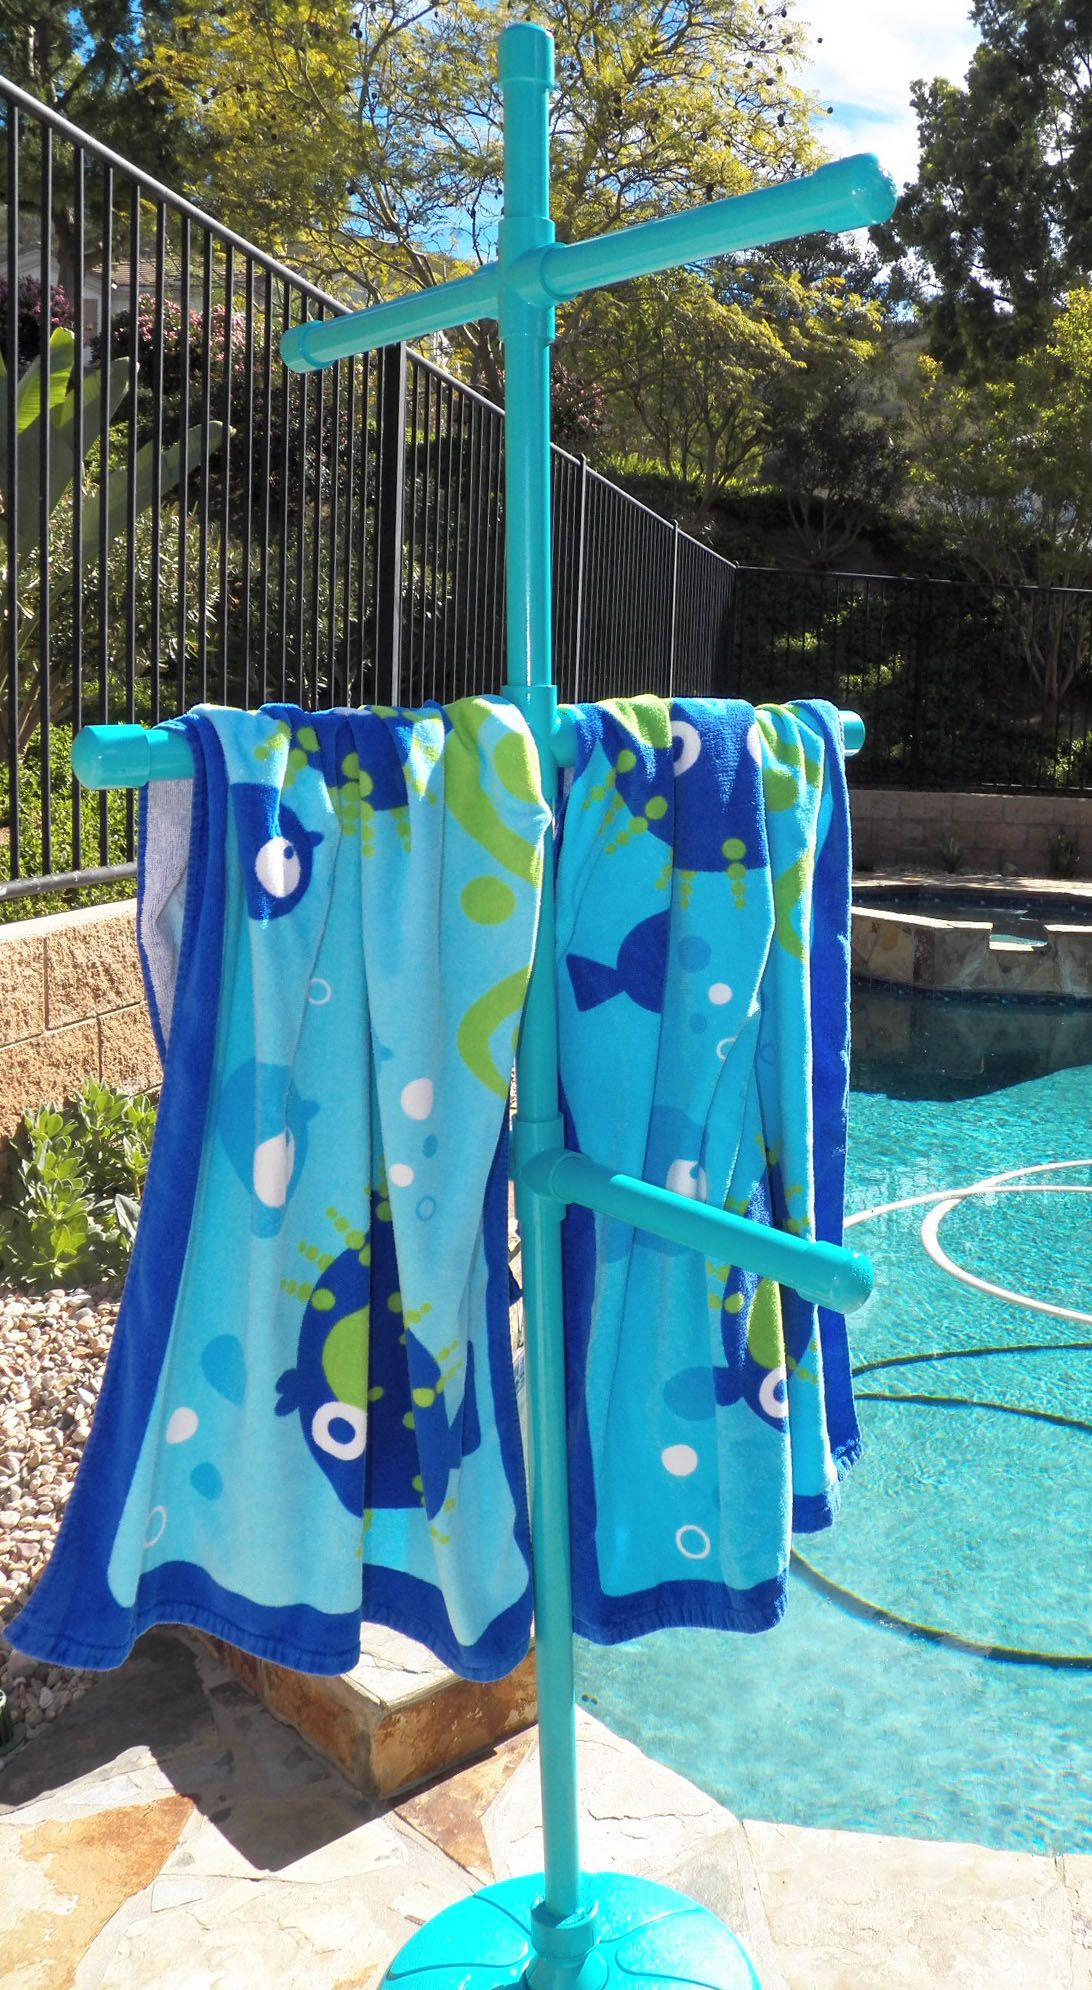 Pool Towel Storage Ideas bronze pool storage towelshelf hamper pottery barn Poolside Towel Tree From Pvc Pipe And A 7 Plastic Umbrella